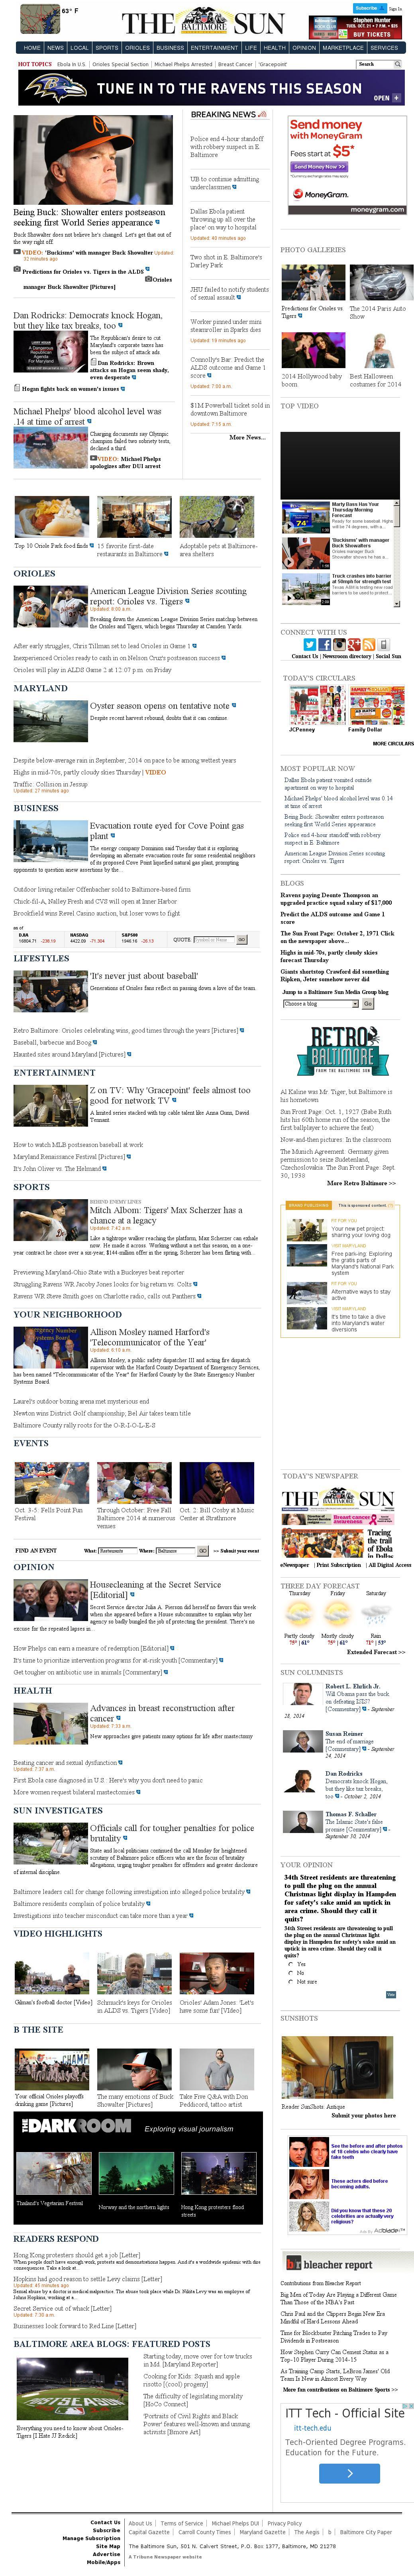 The Baltimore Sun at Thursday Oct. 2, 2014, 1 p.m. UTC